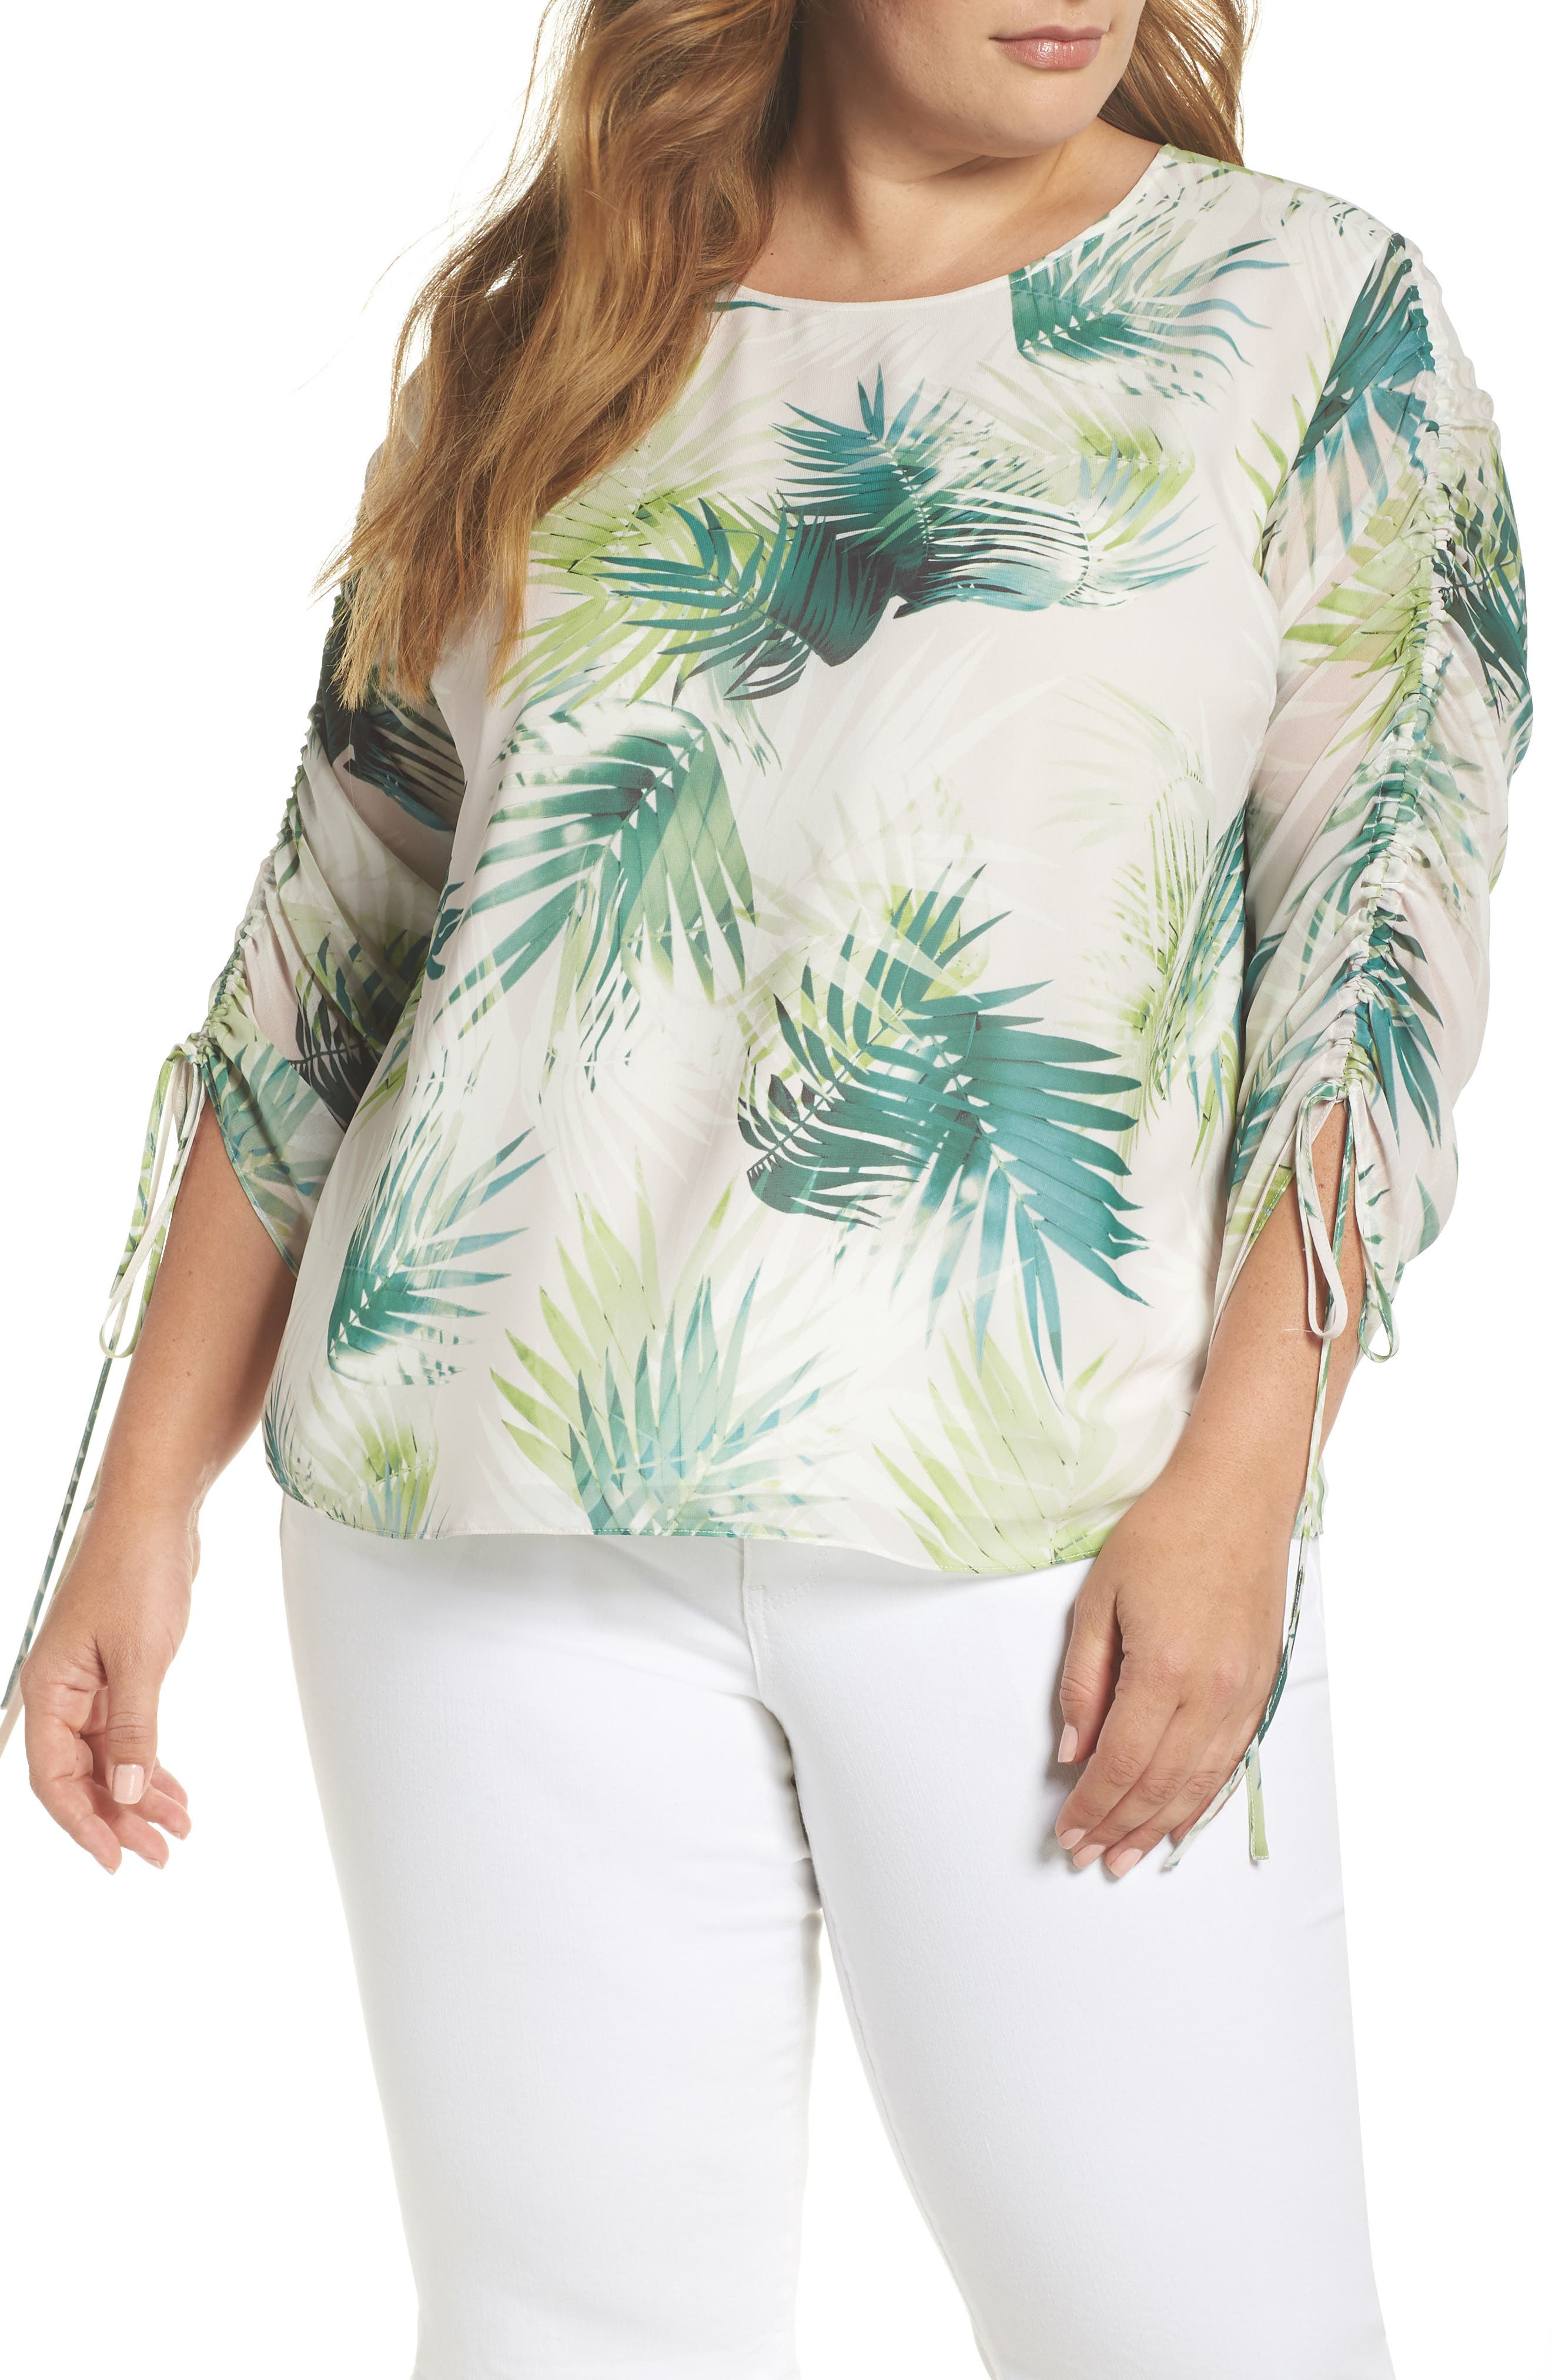 Drawstring Sleeve Sunlit Palm Print Top,                             Main thumbnail 1, color,                             Verdant Green